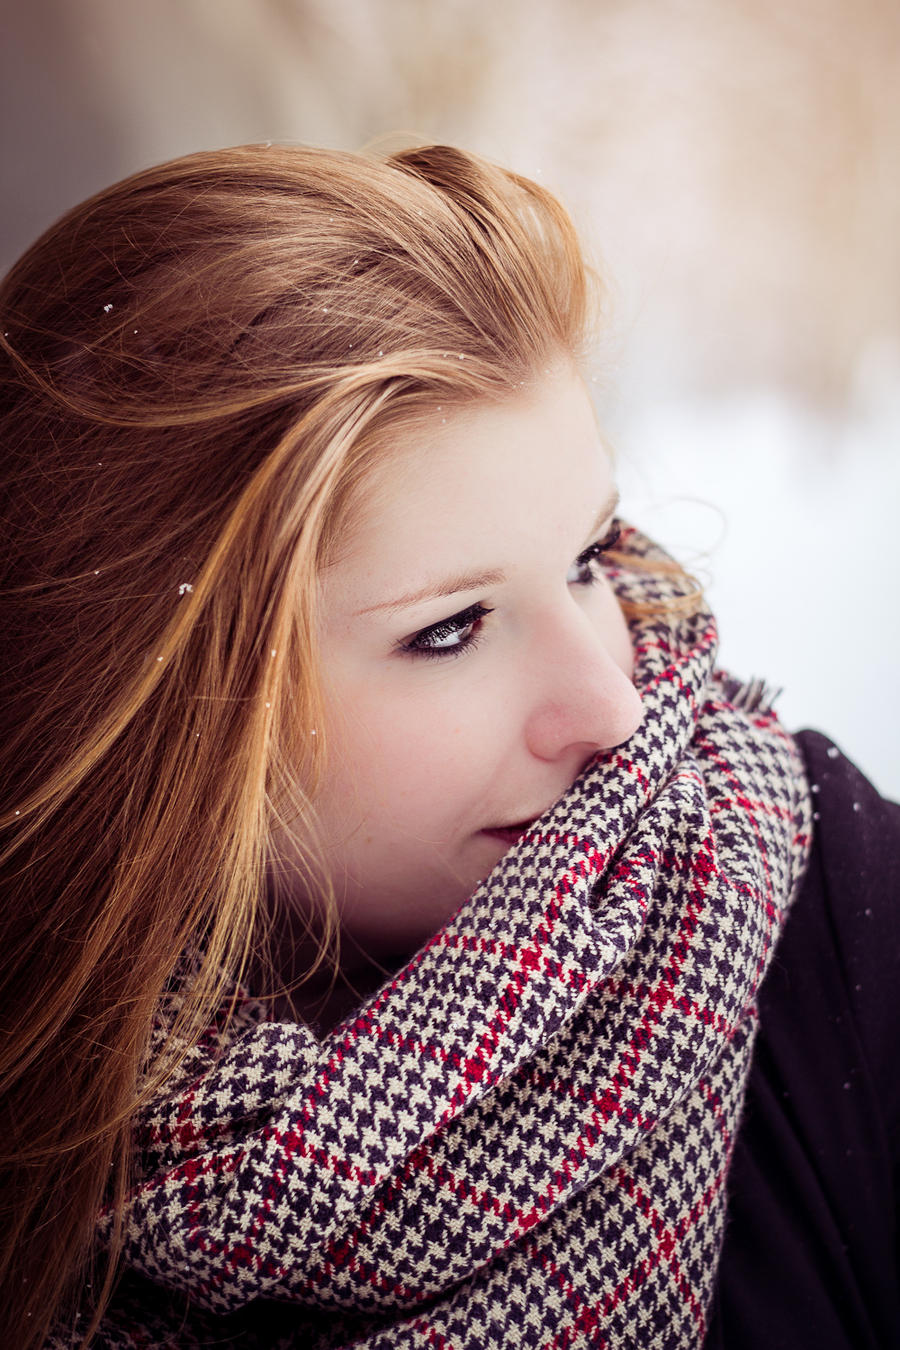 Snowy IV by Fr34kZ